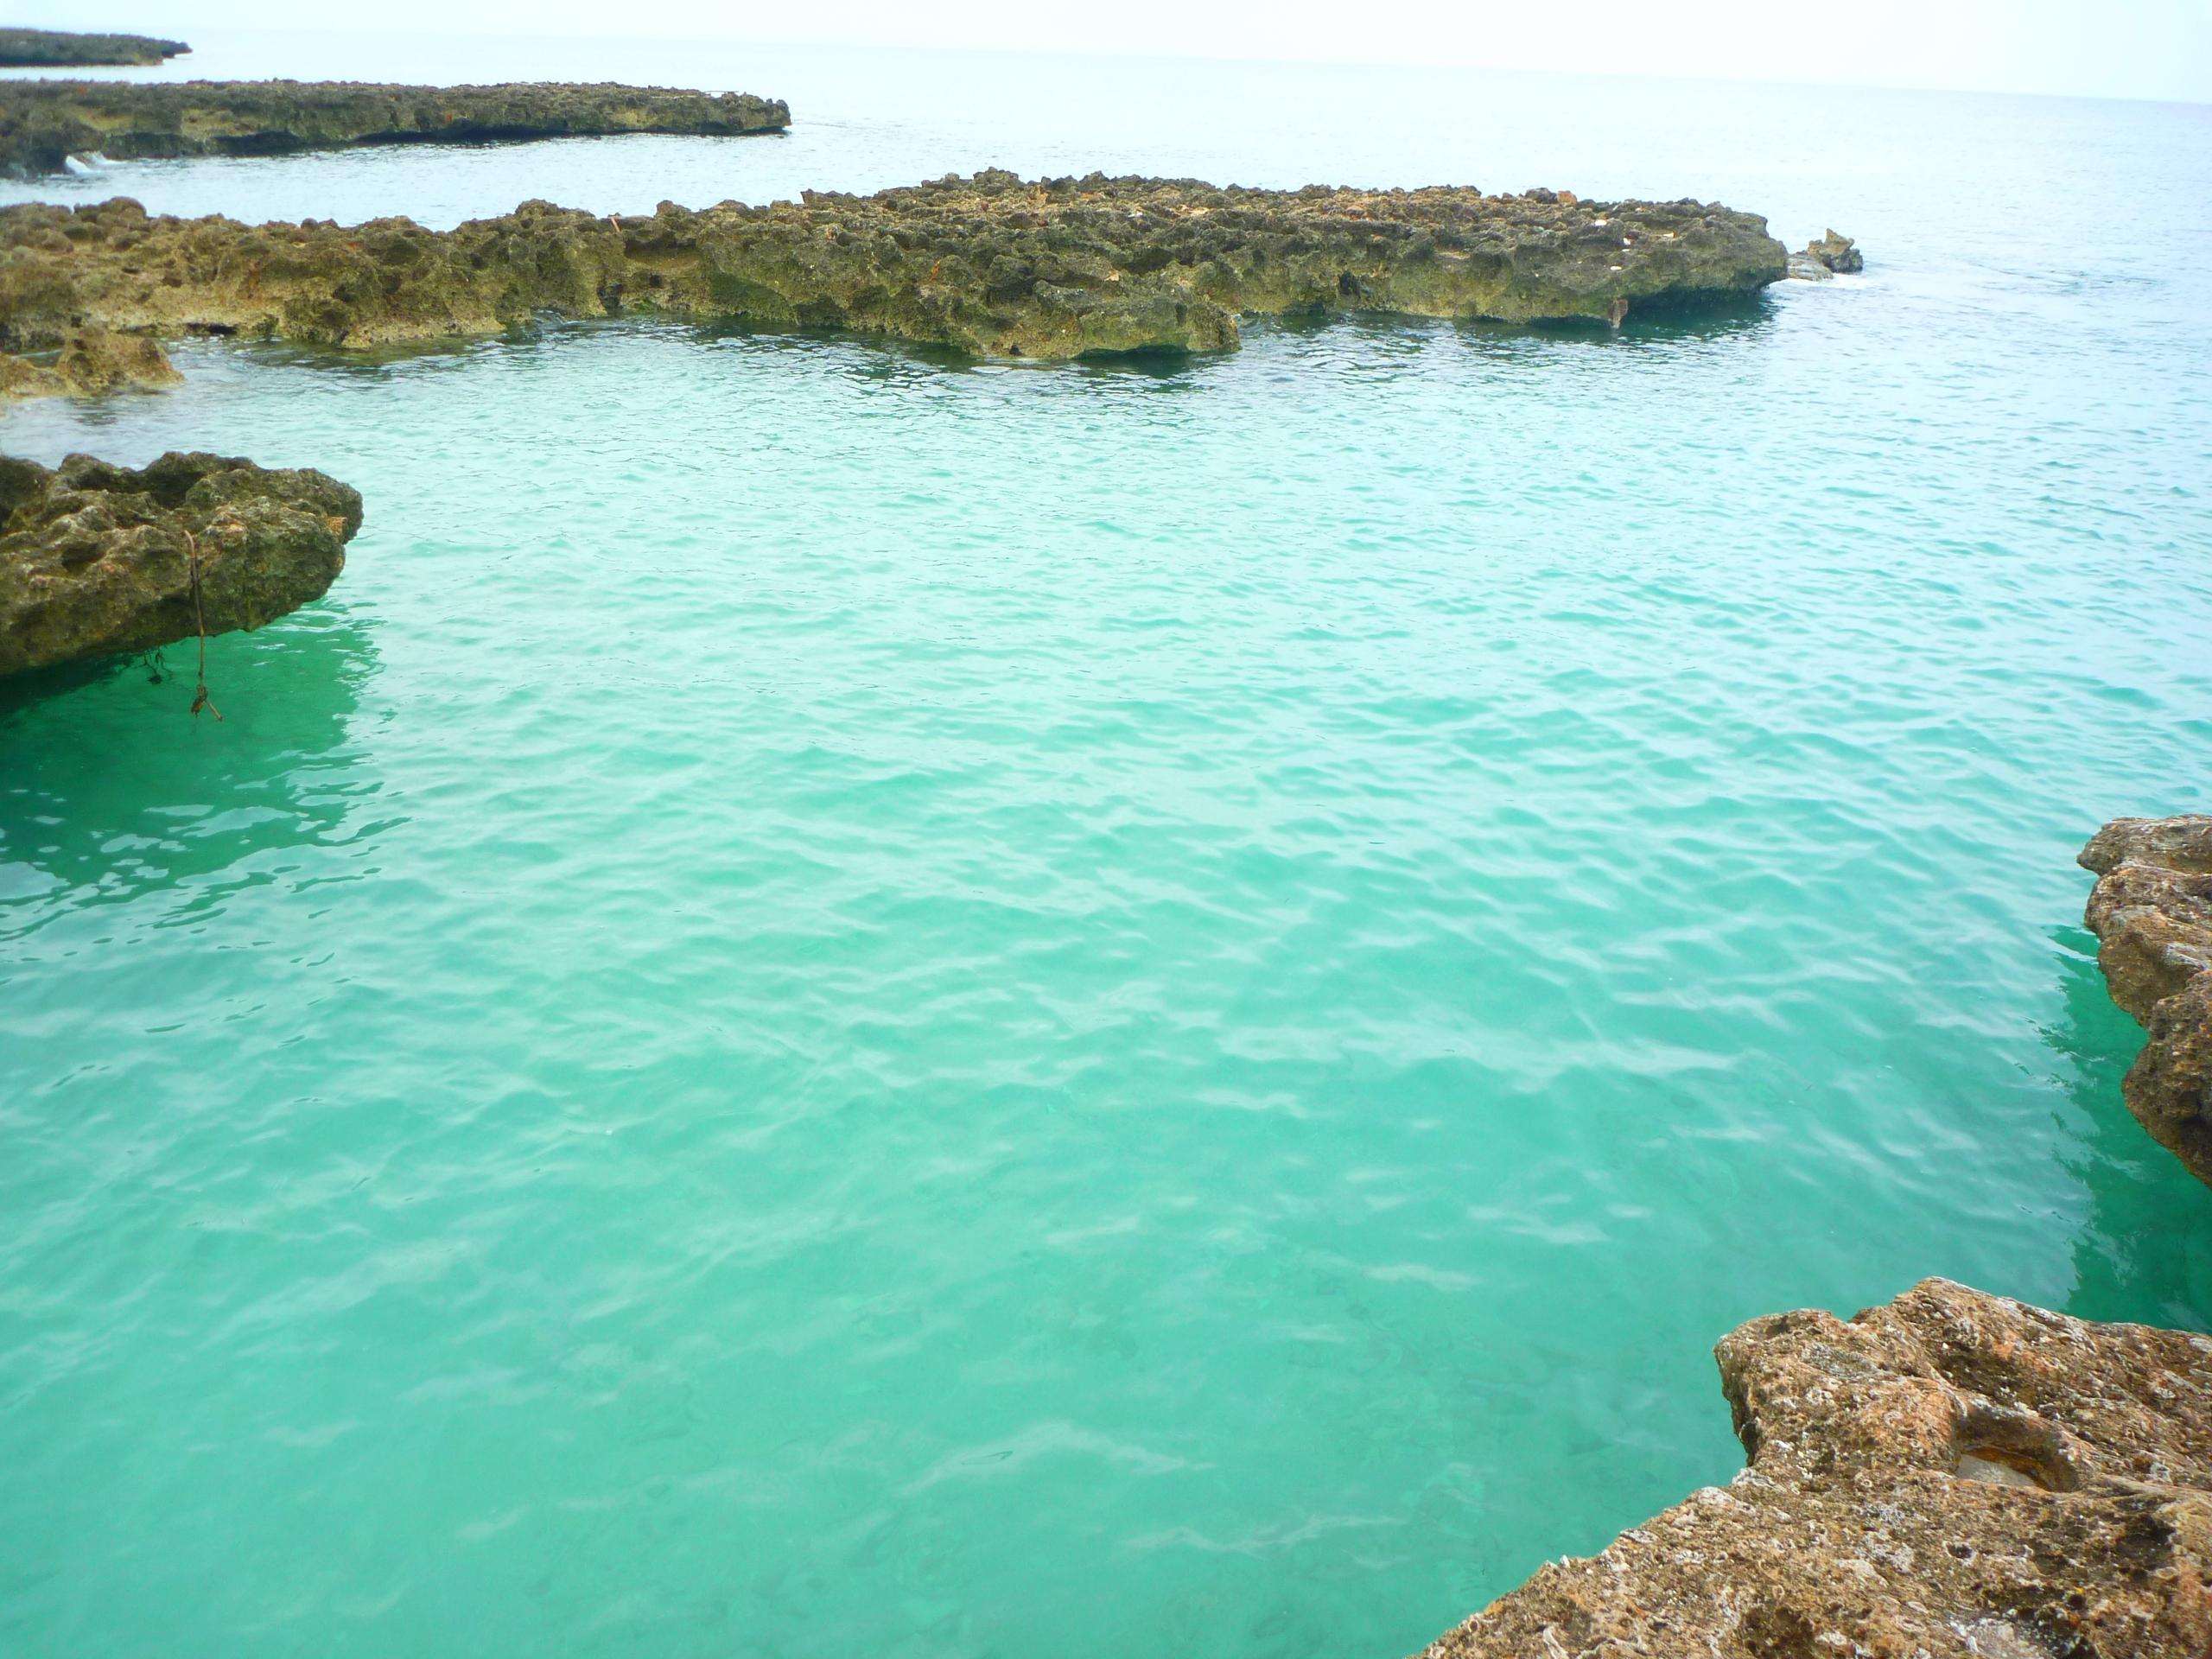 Playa La Boca